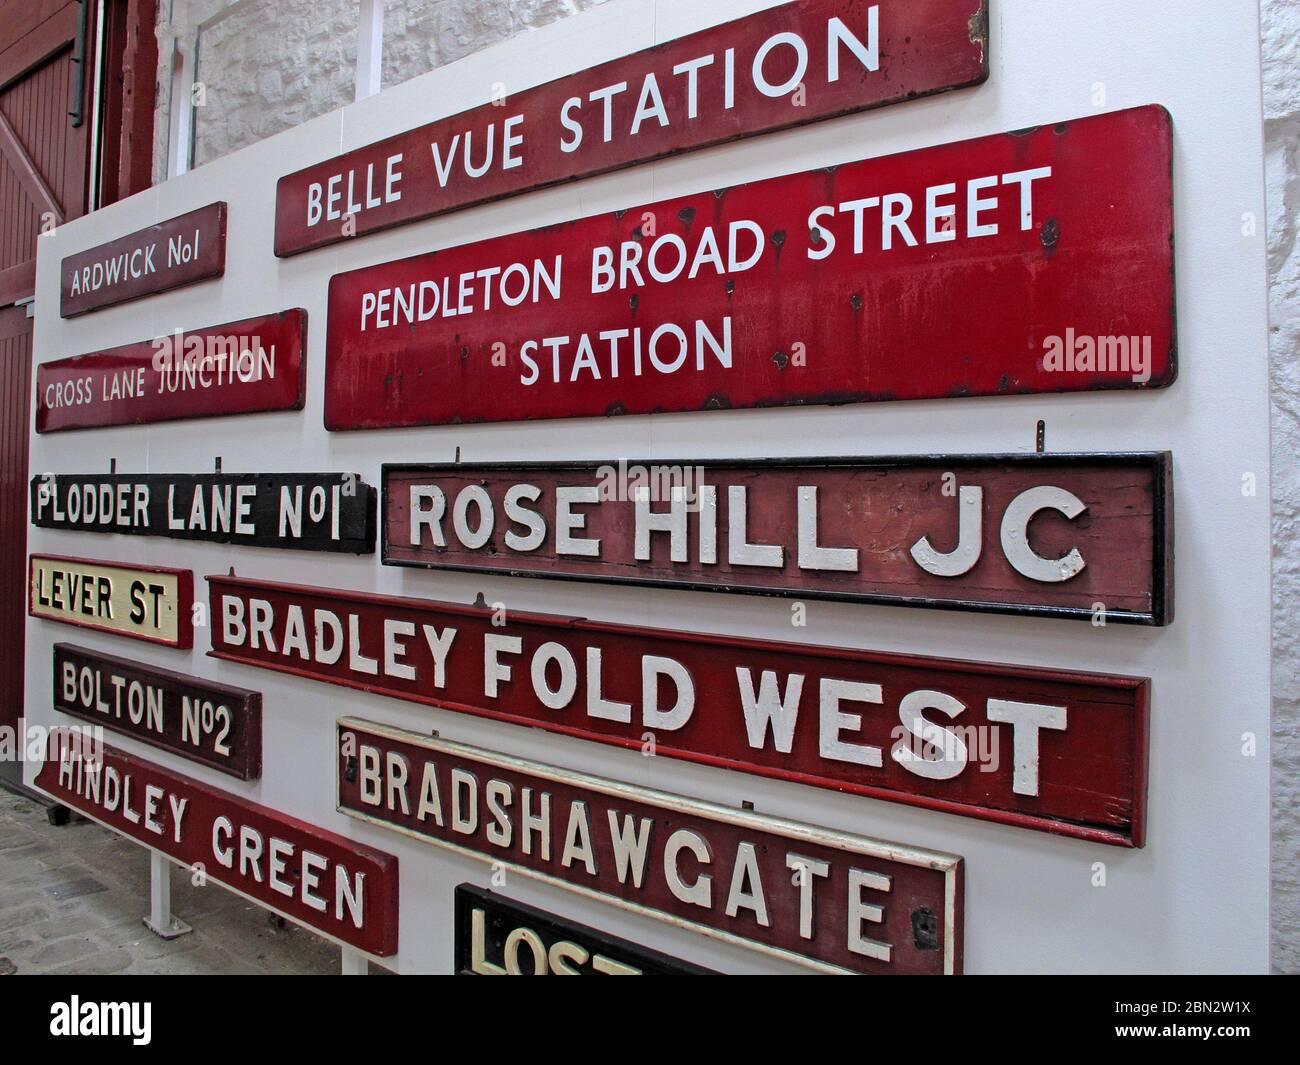 GoTonySmith,Hotpixuk,@Hotpixuk,Greater Manchester,station,pre,signs,sign,historic,Rose Hill JC,Bradshawgate,junction,Belle Vue,lost,Lancs,Lancashire,rail,rail cuts,museum